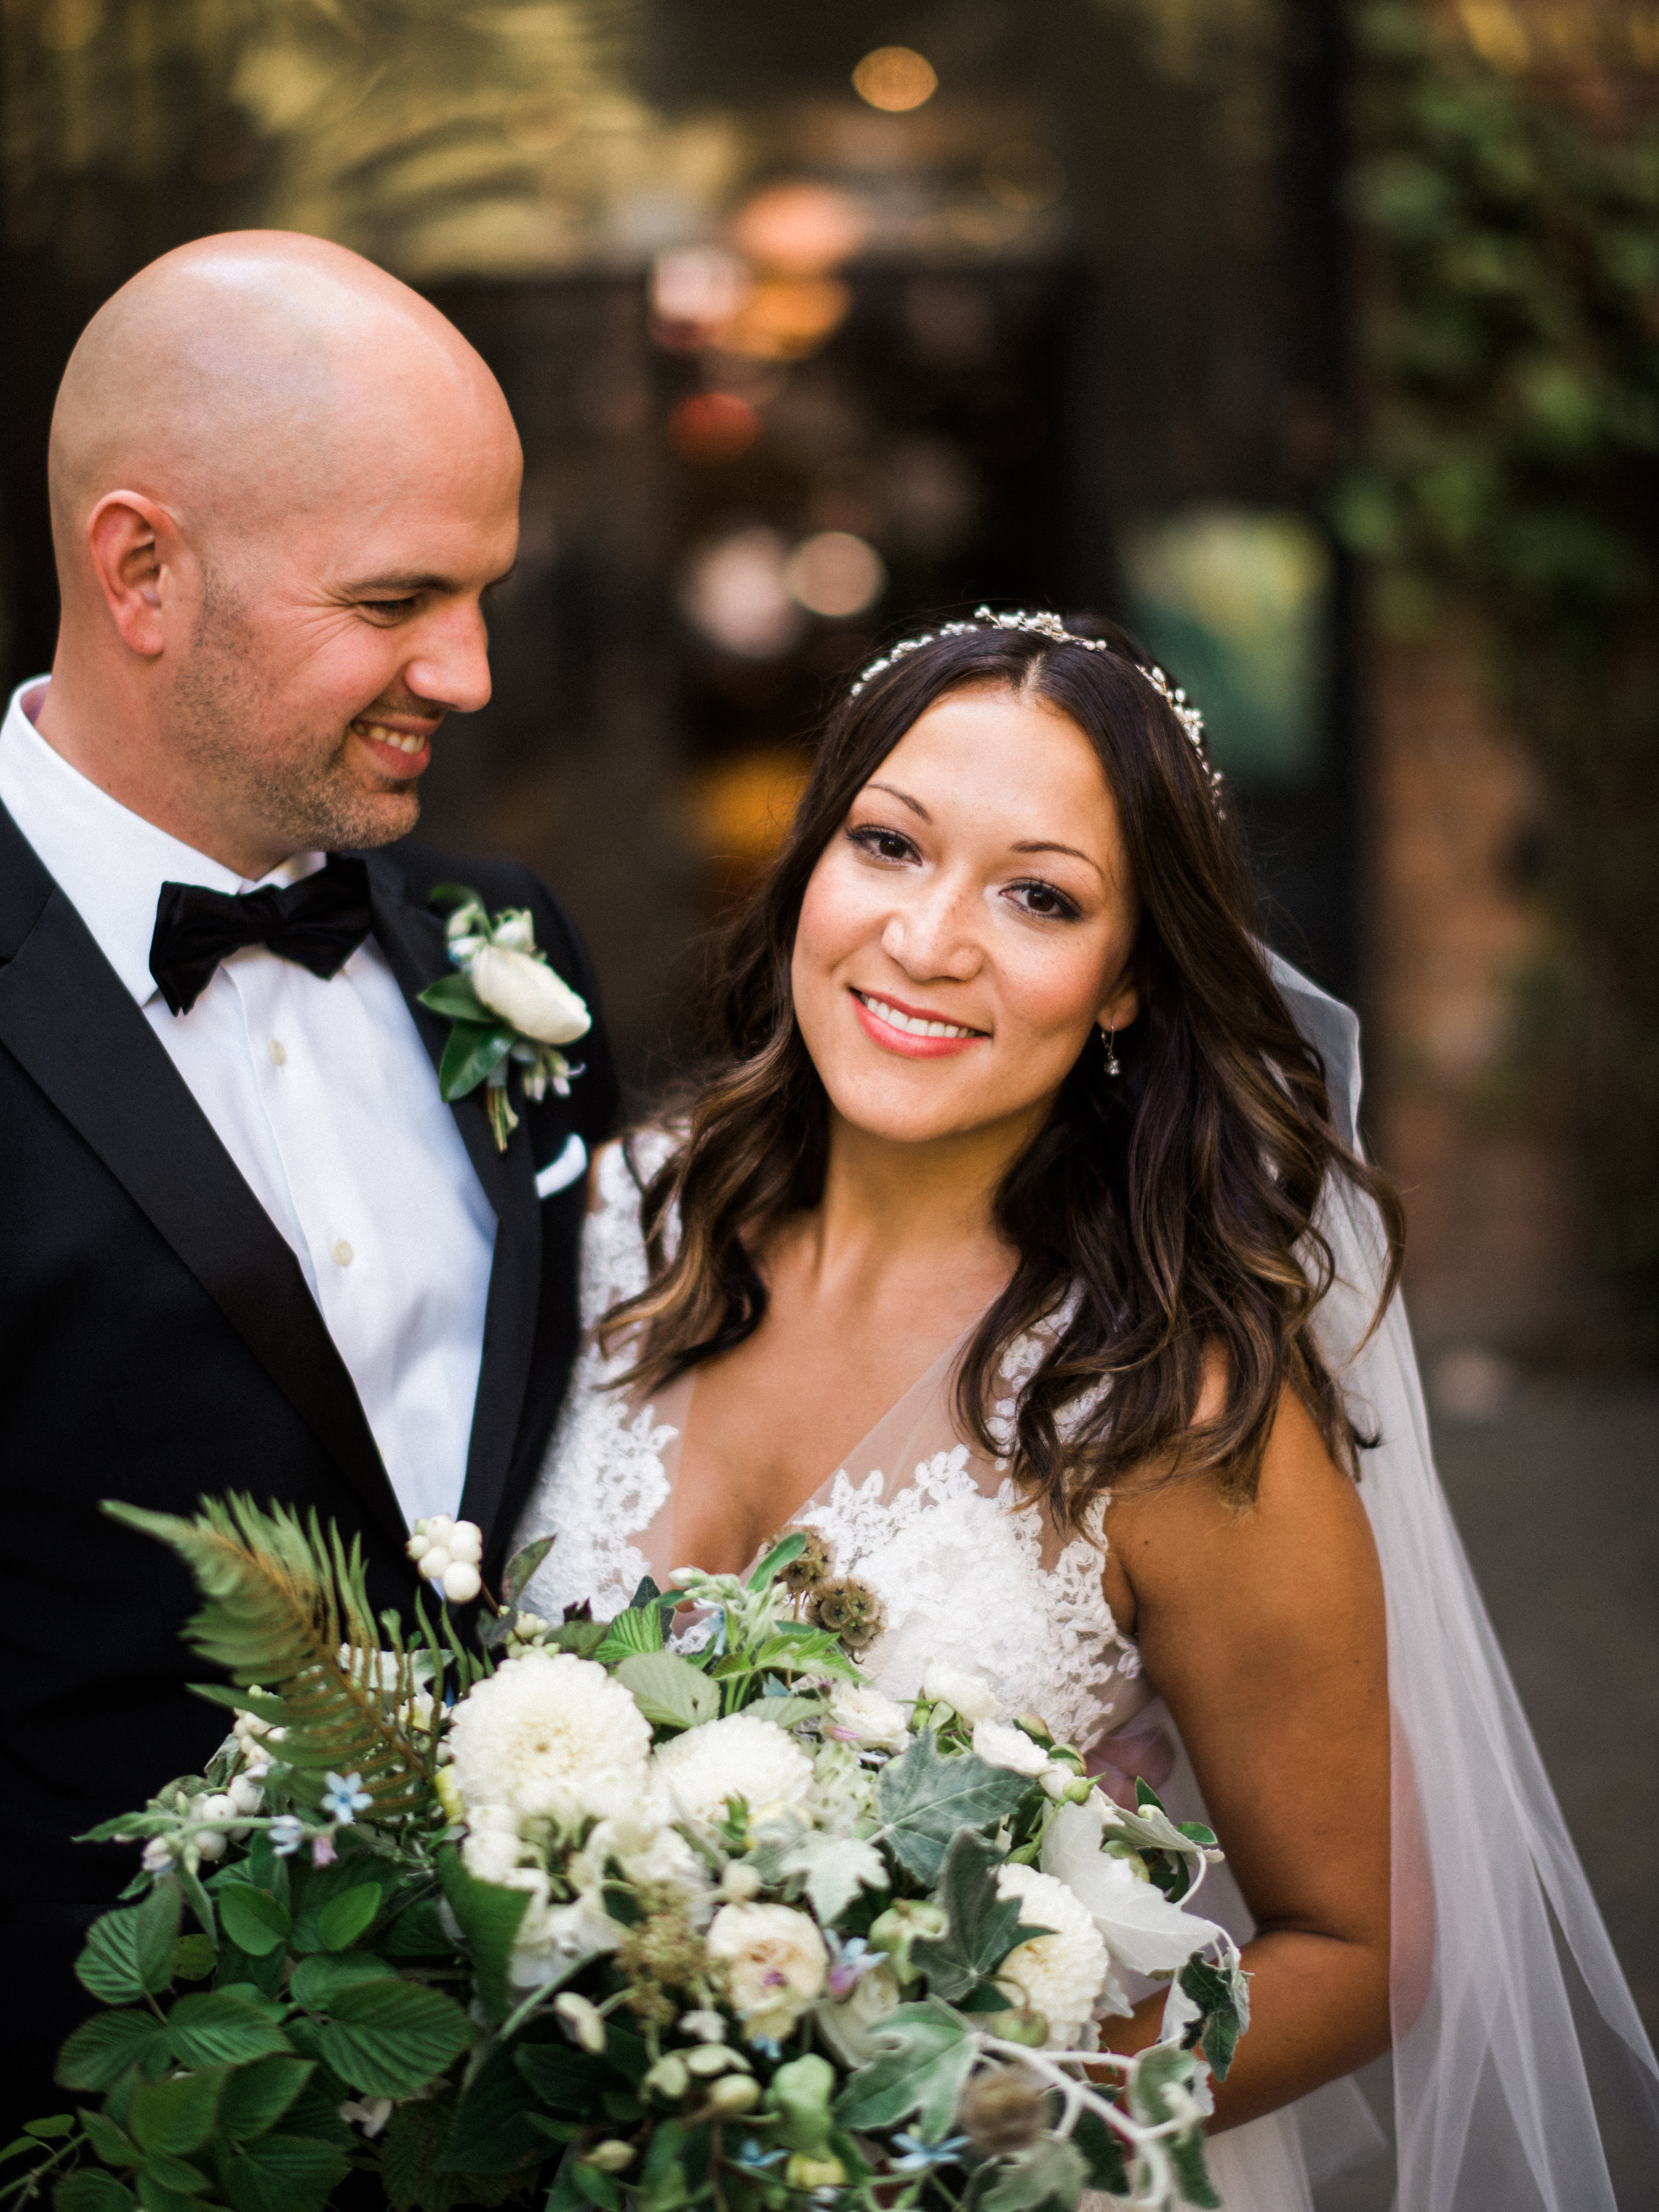 erintommy-four-seasons-seattle-wedding-ryan-flynn-photography-portraits-0017.JPG